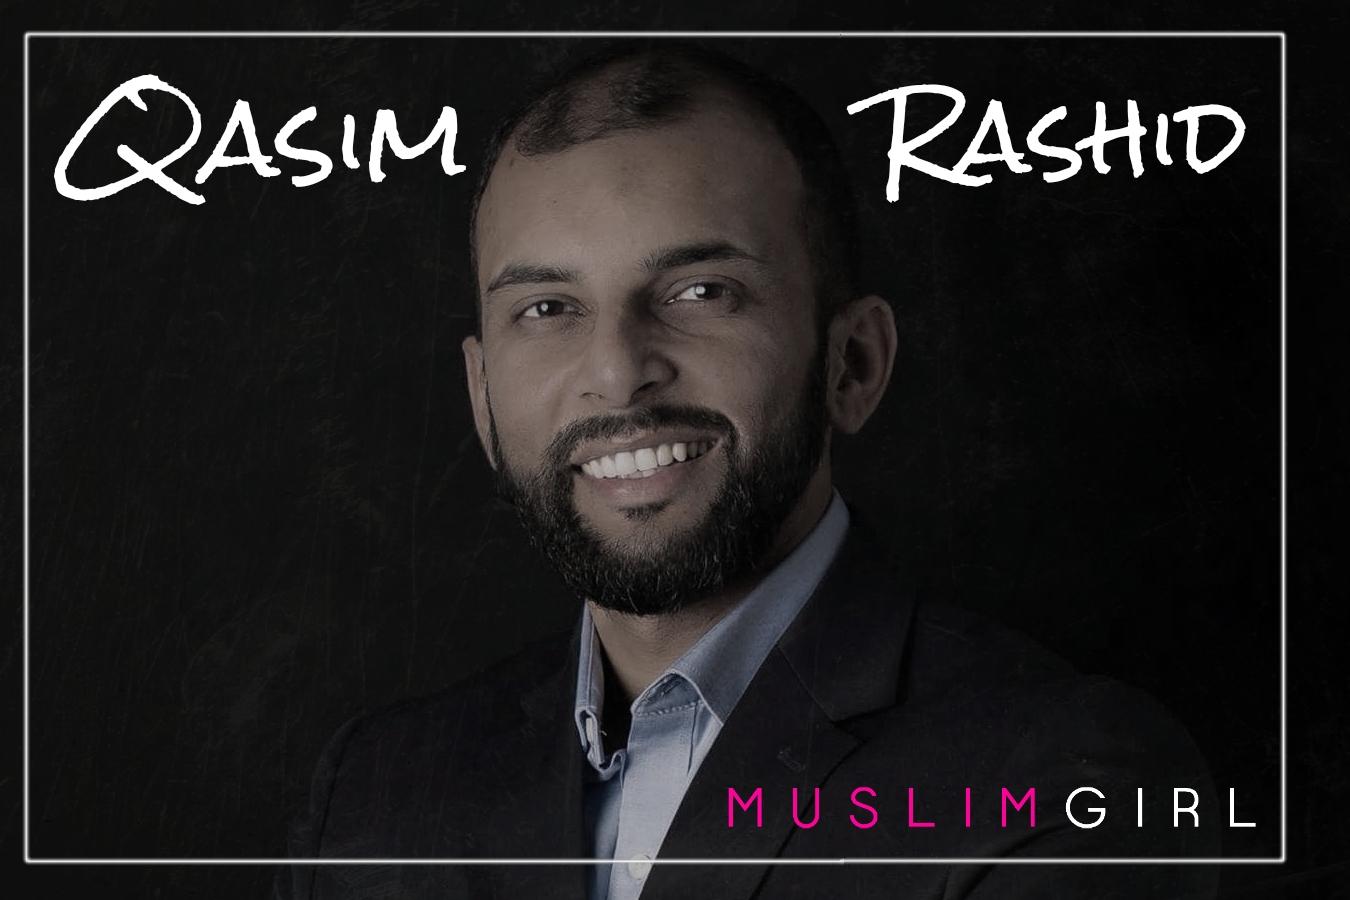 muslim single men in charleston afb Charleston county there are more women than men in charleston county adams run, awendaw, charleston, charleston afb, edisto island.